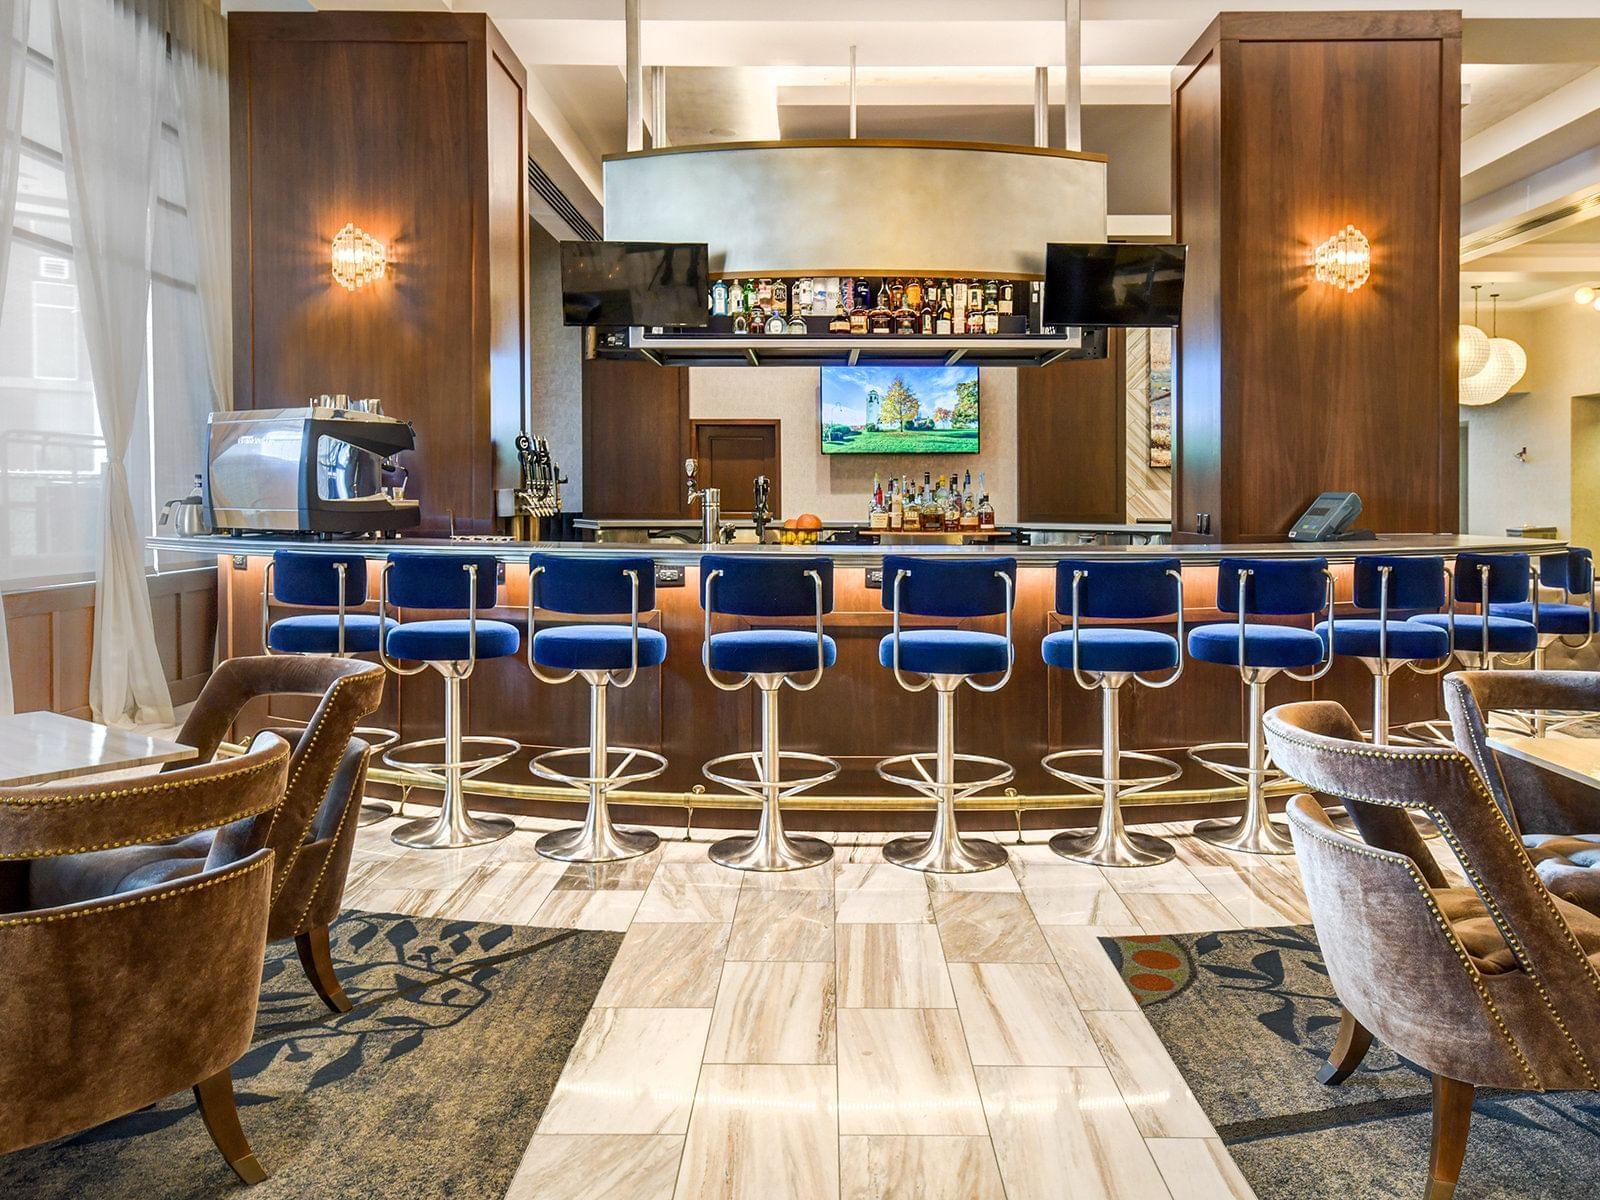 row of chairs at a bar